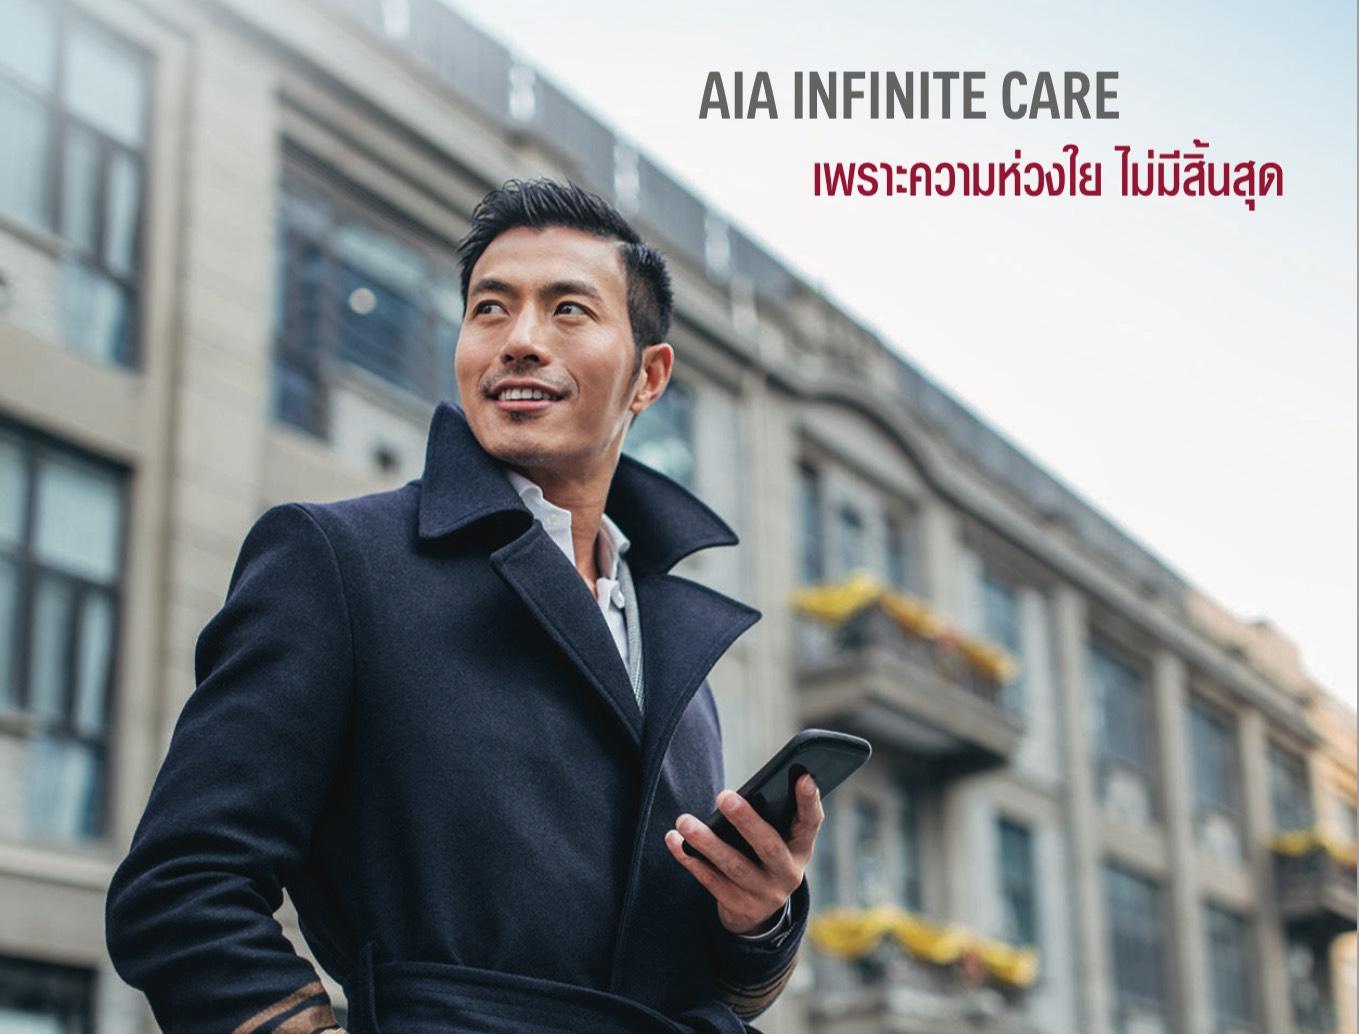 AIA INFINITE CARE